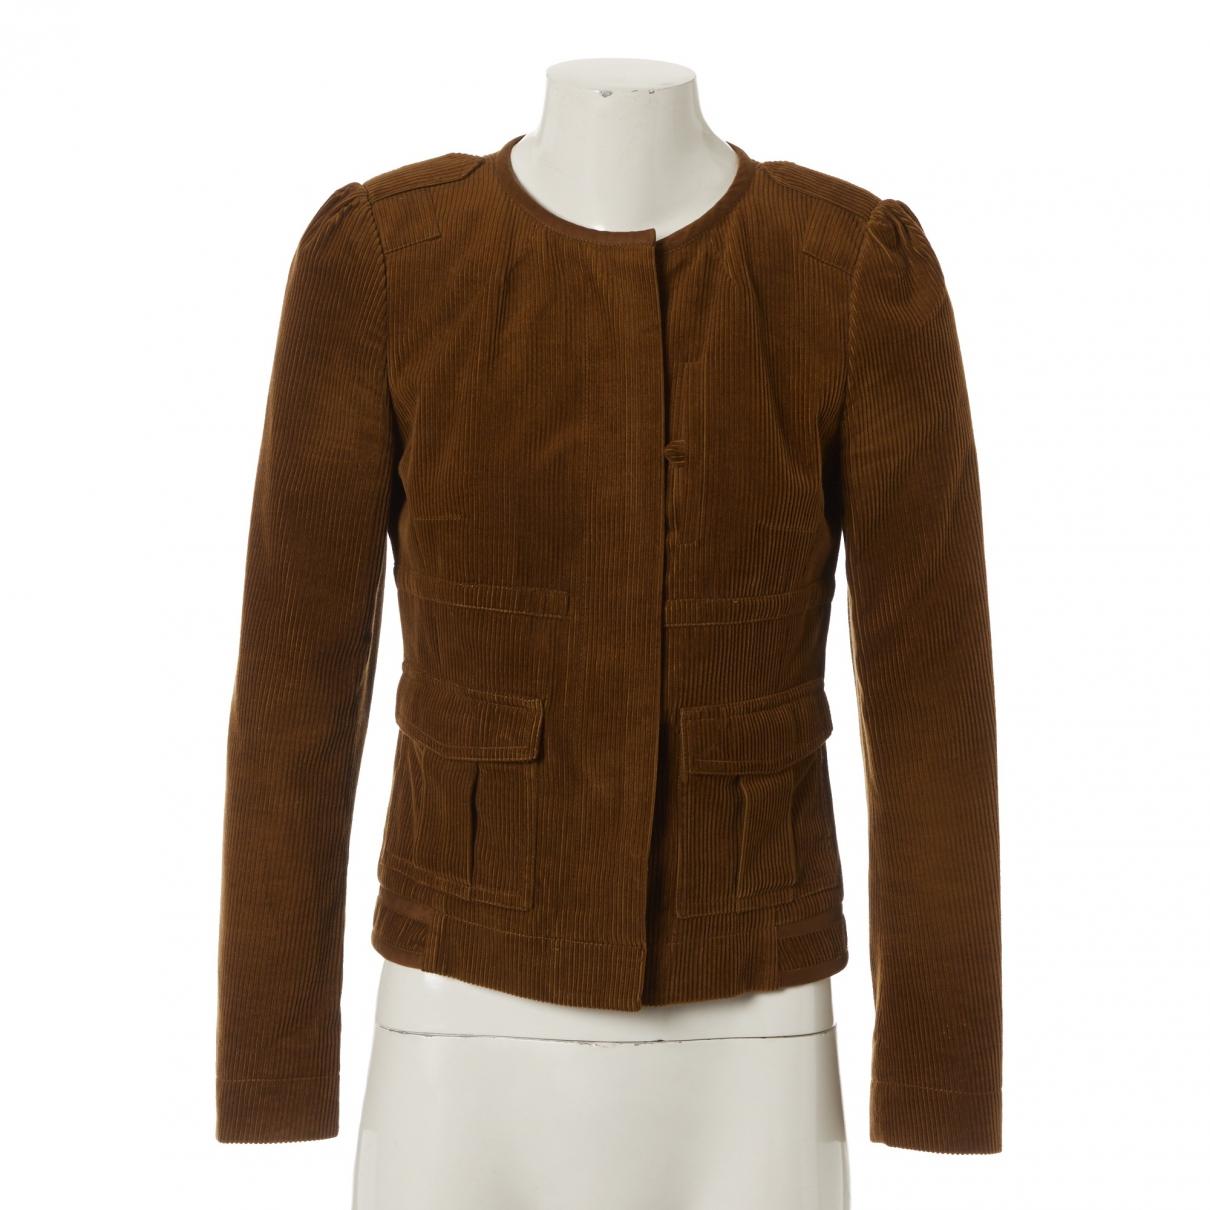 Chloé \N Brown jacket for Women 38 FR